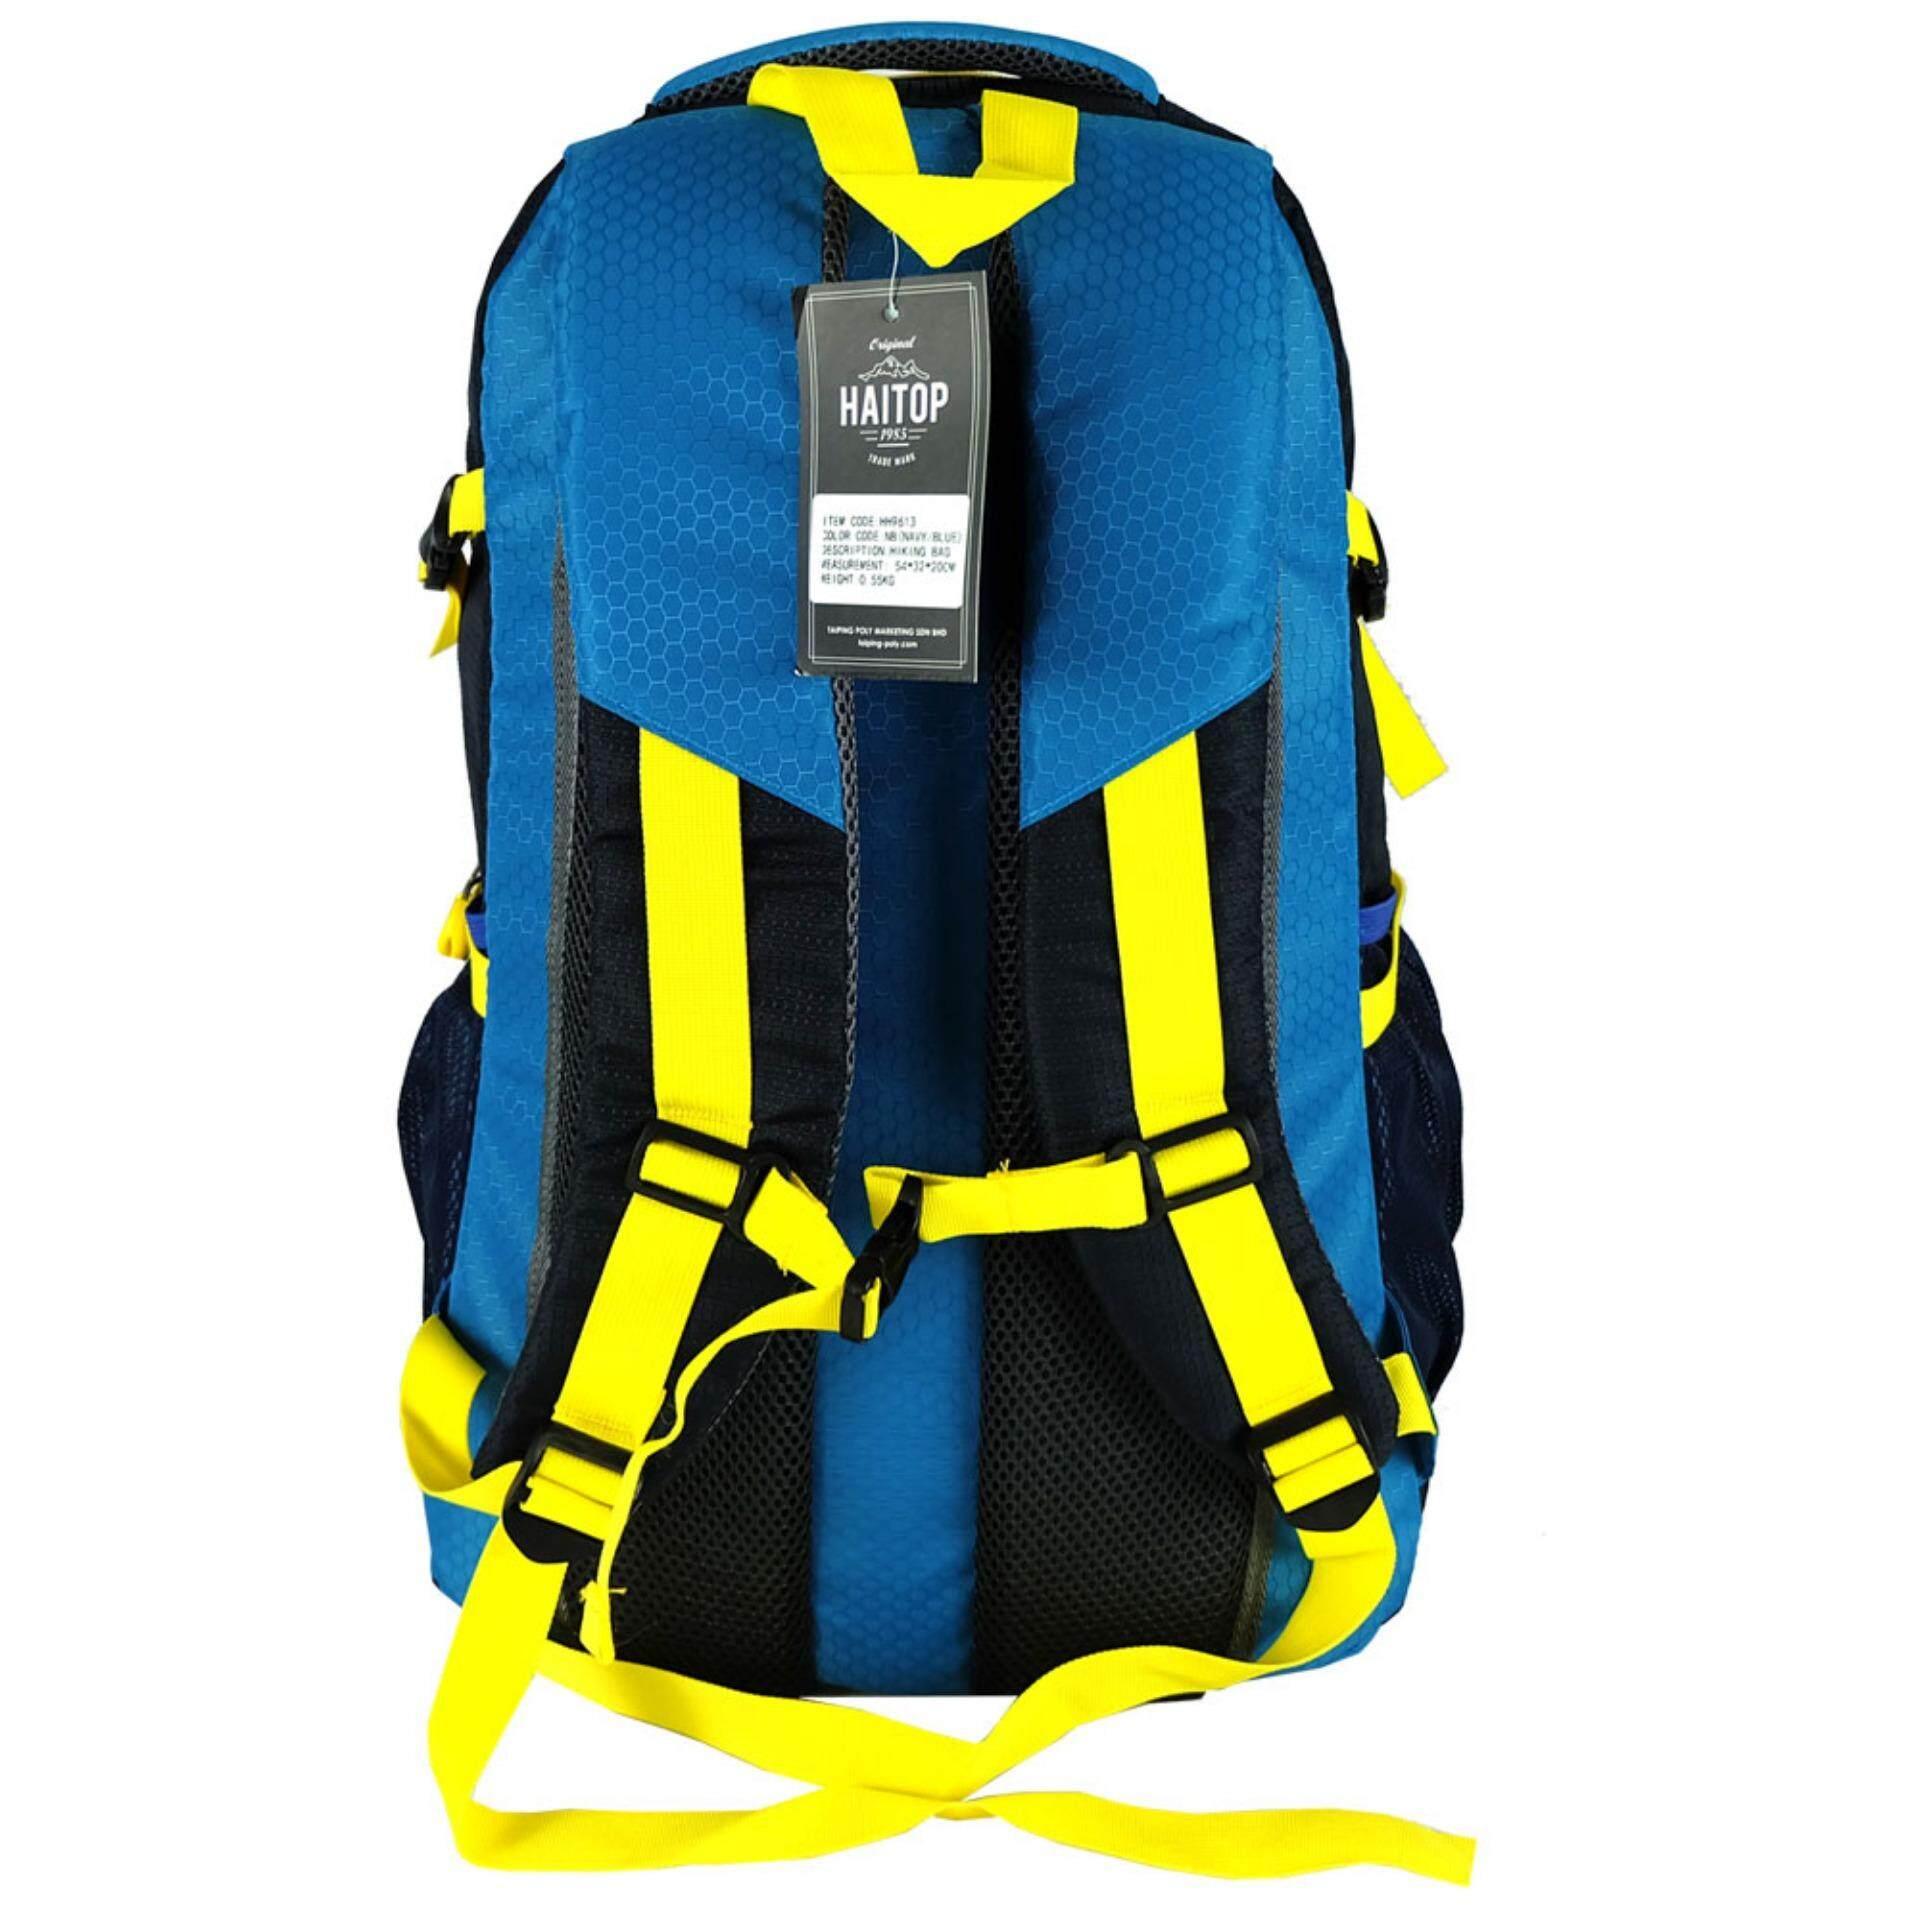 Haitop Weekender - 3 in 1 Trolley Bag + Hiking Backpack + Waist Pouch Set